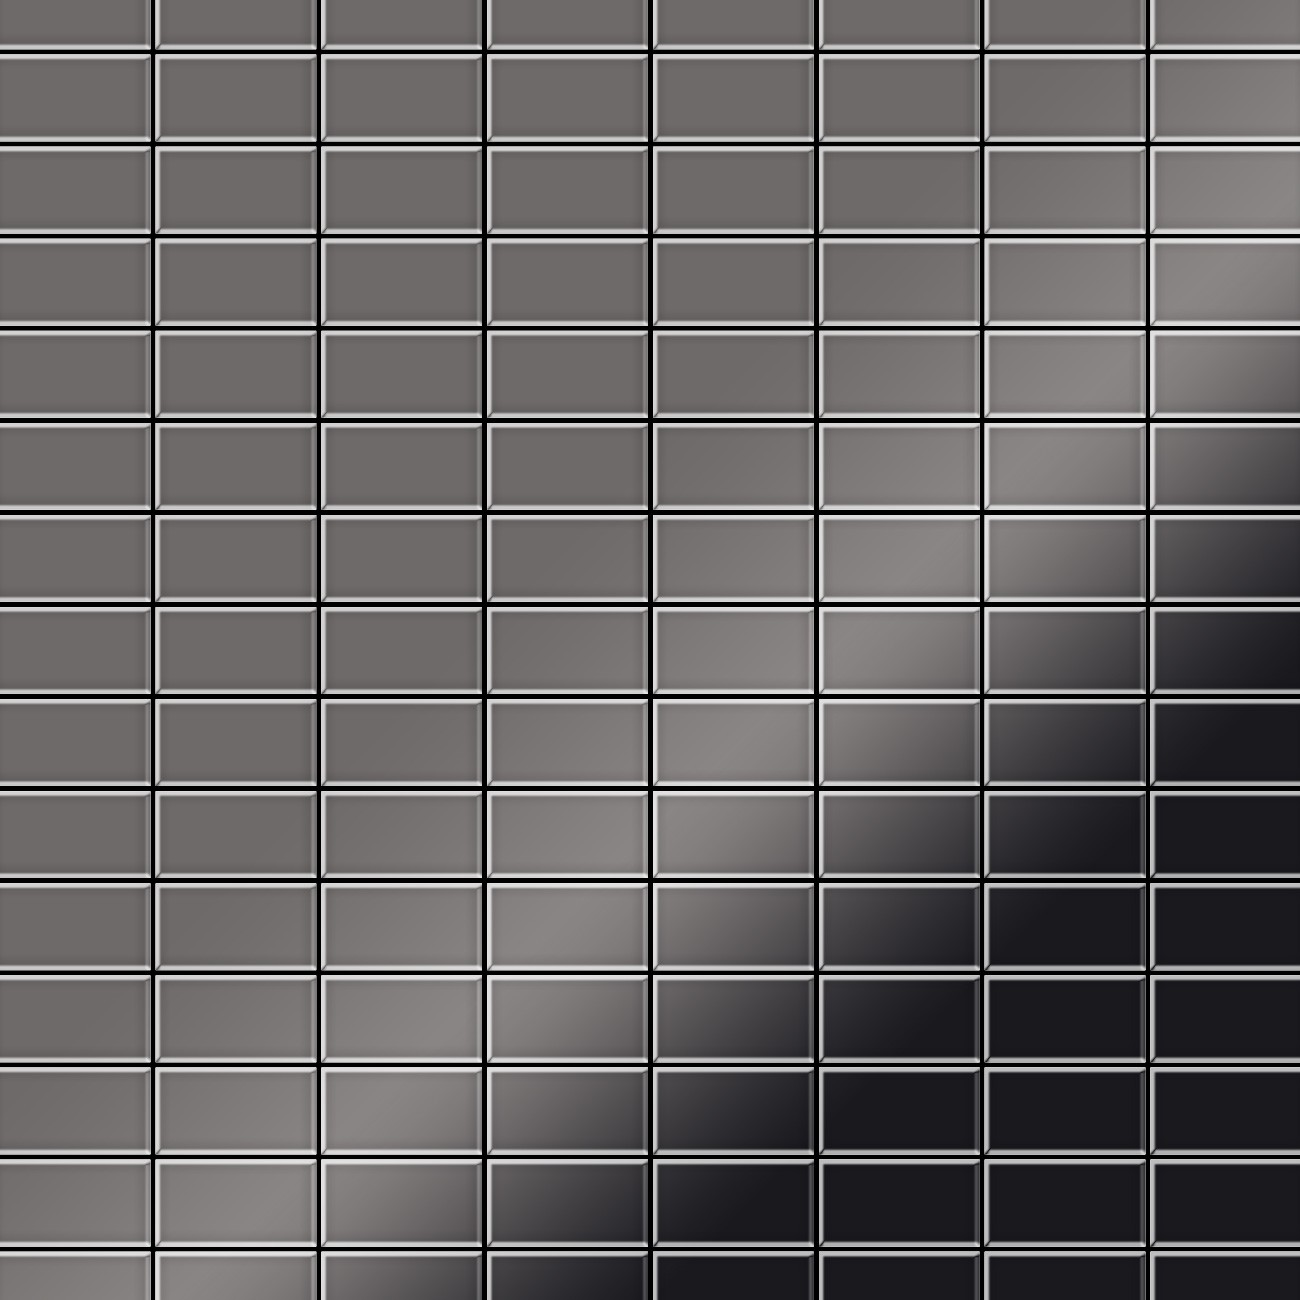 Metallmosaik fliesen aus massivem titan hochgl nzend in for Bauhaus 3d tapete